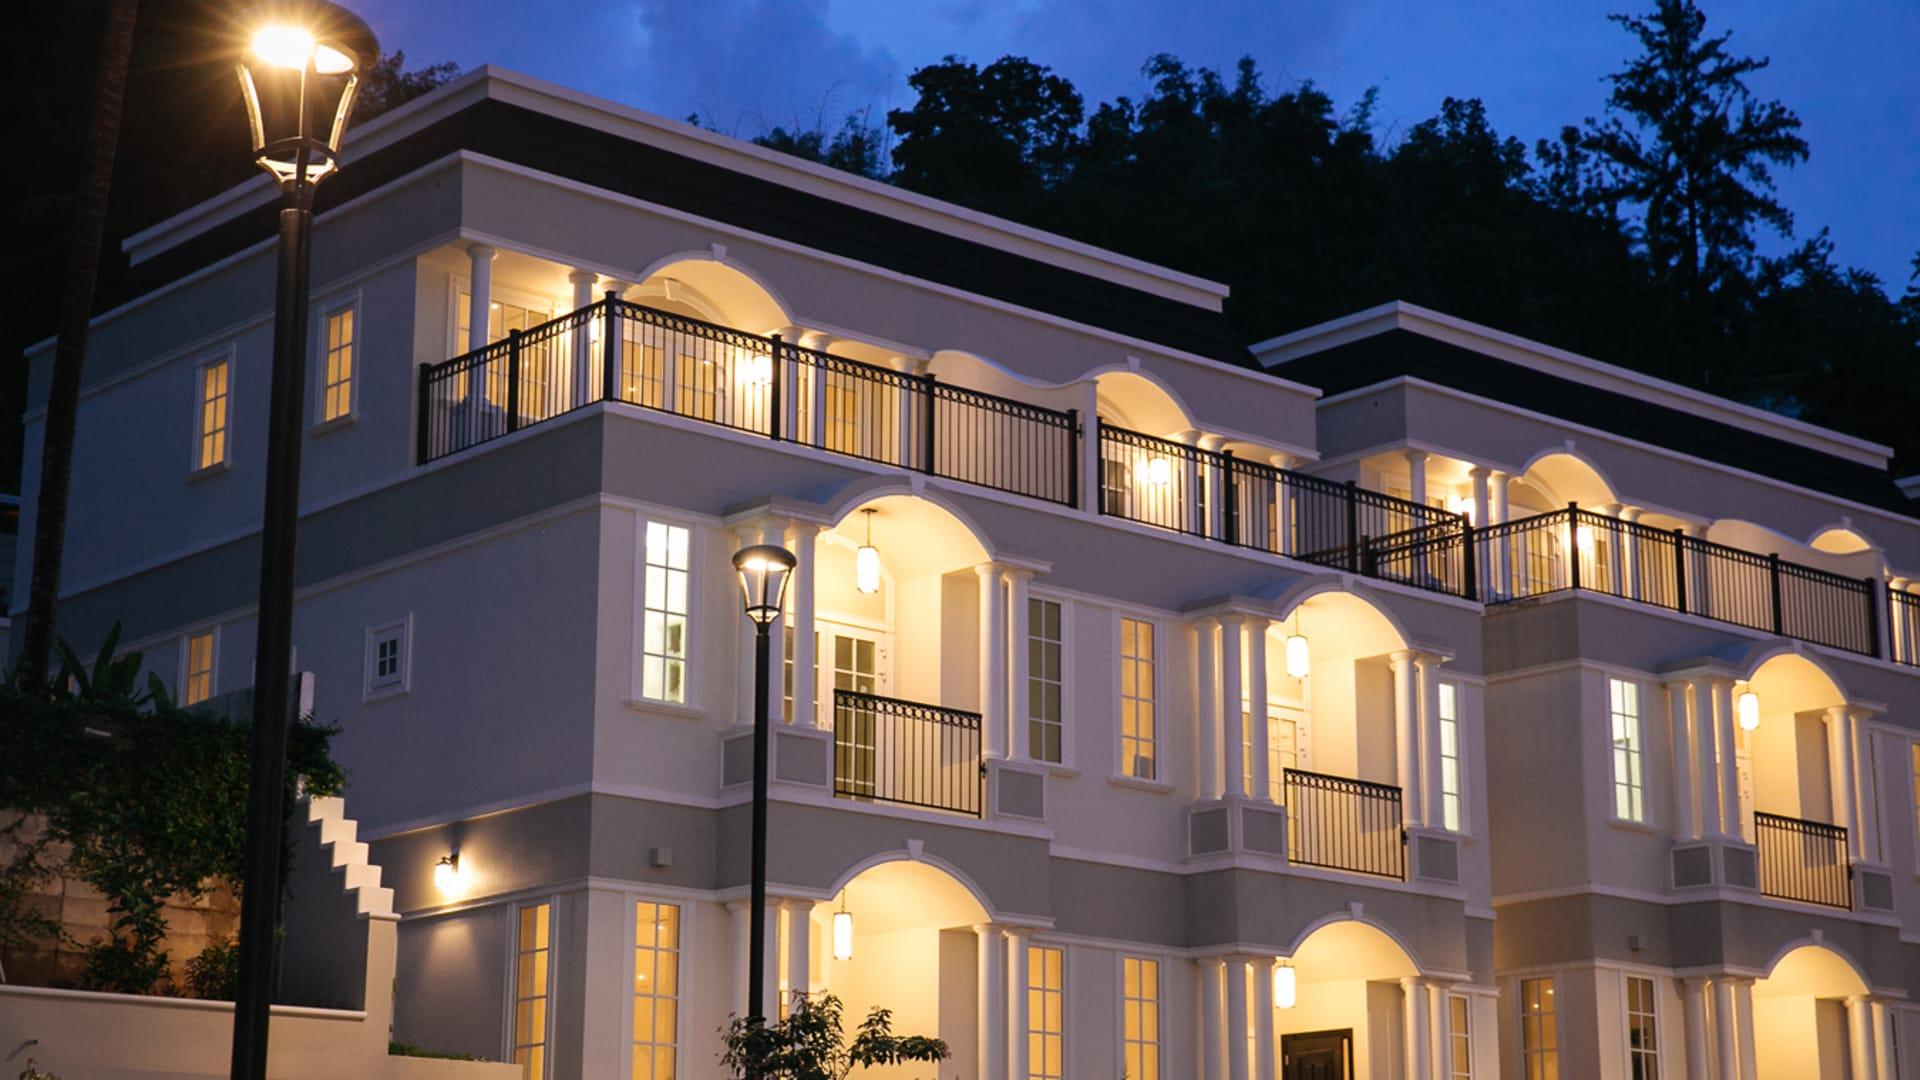 Chateau De Chantilly Unit 2 Townhouse Trinidad Luxury